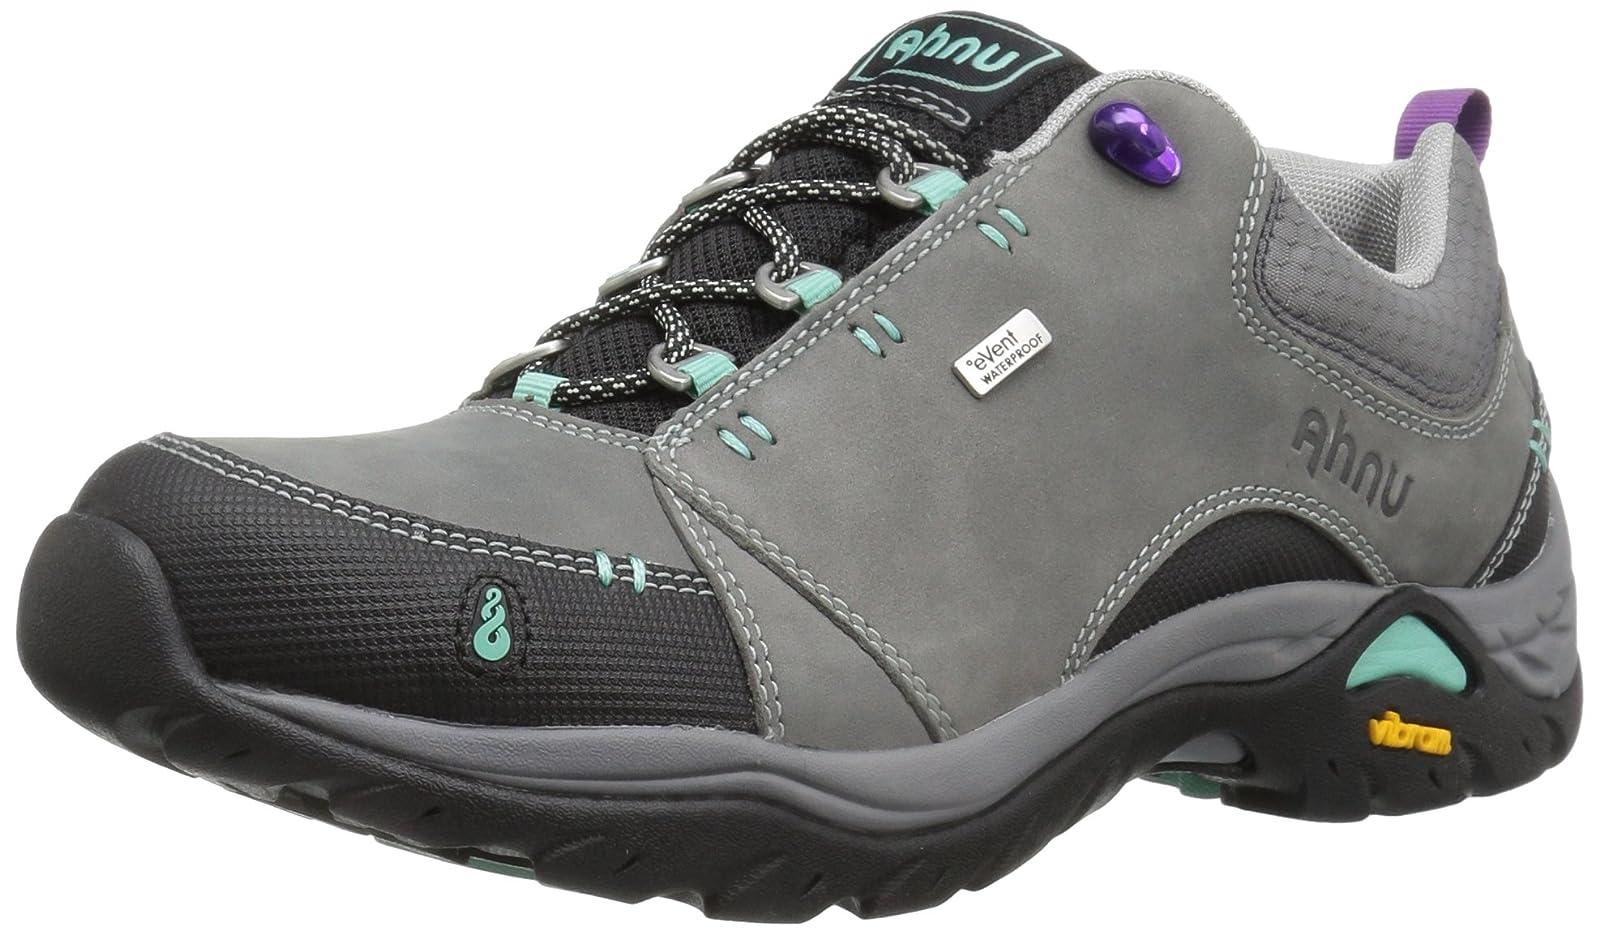 Ahnu Women's Montara II Hiking Shoe Black 6 B(M) US - 1